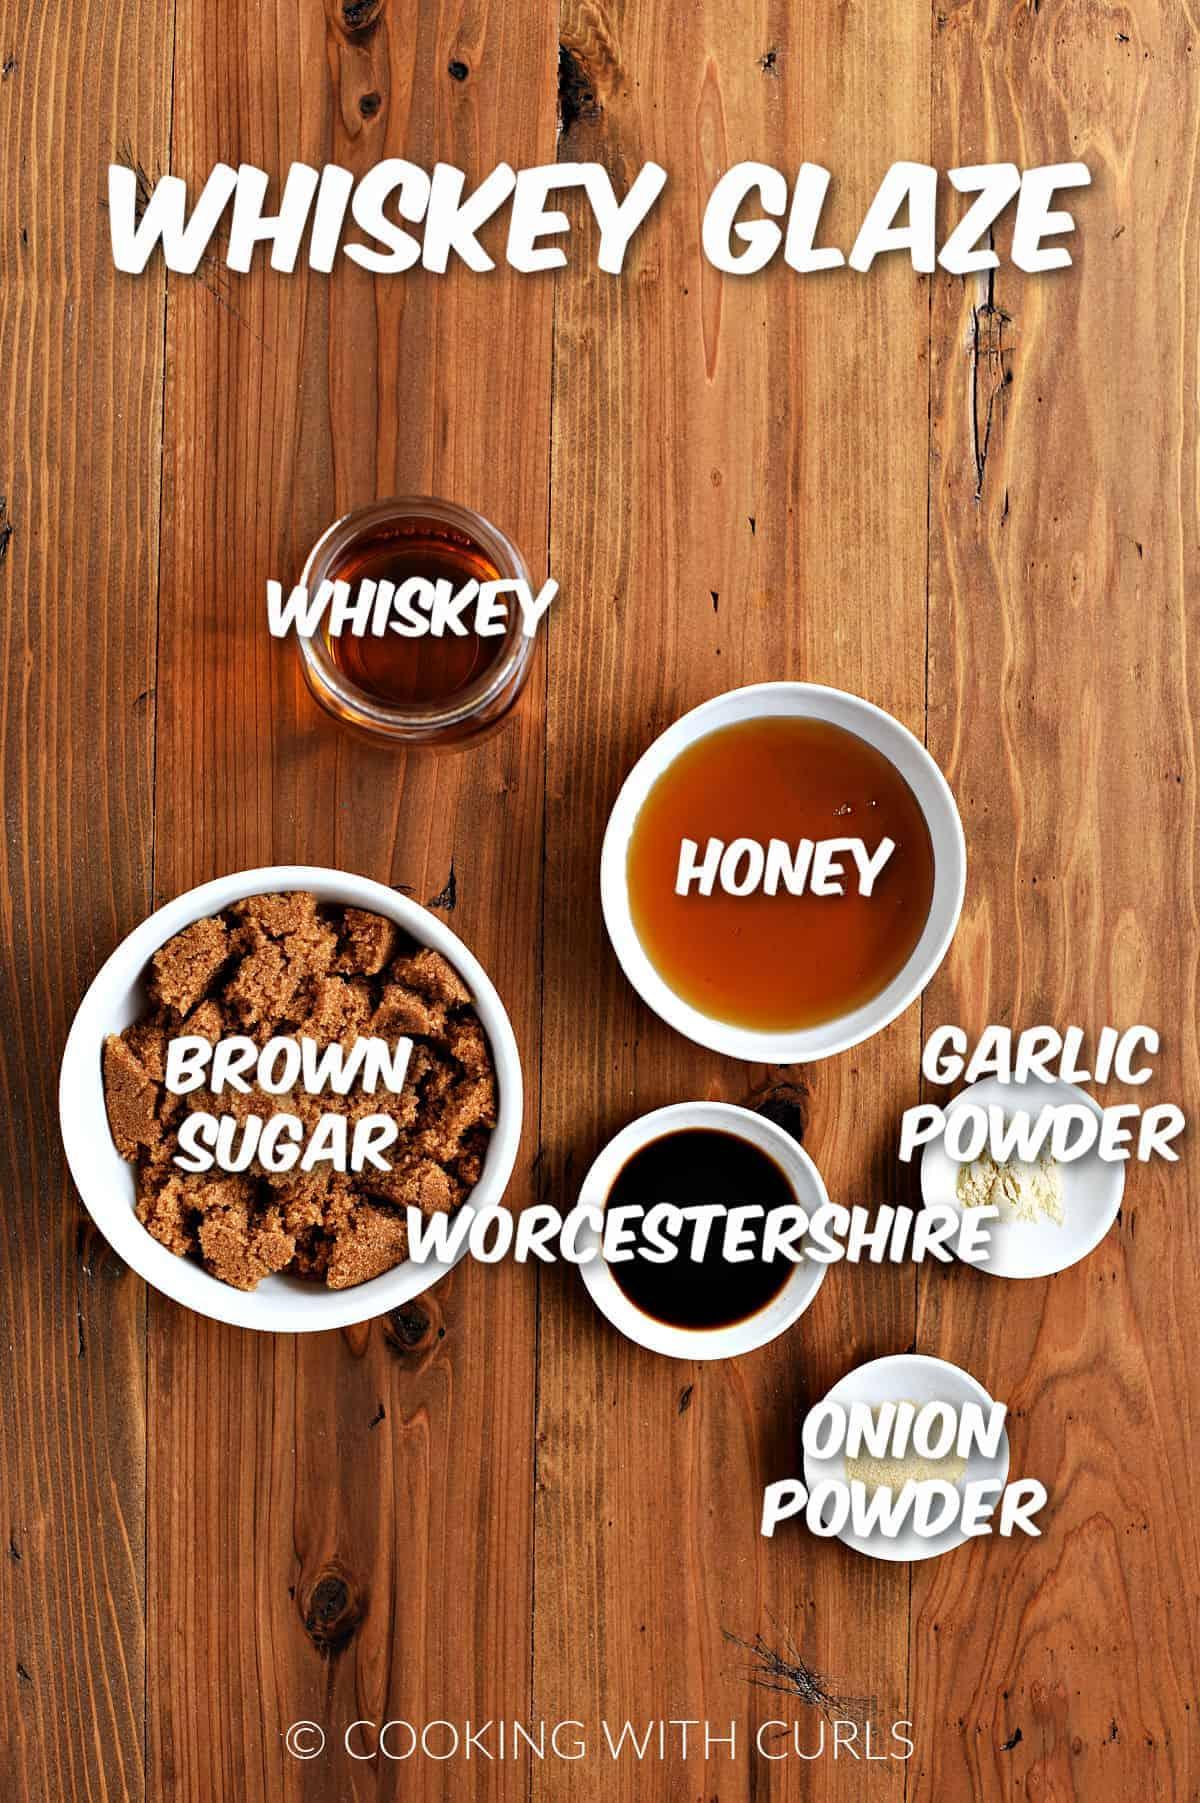 Whiskey, honey, brown sugar, garlic powder, onion powder, and Worcestershire.